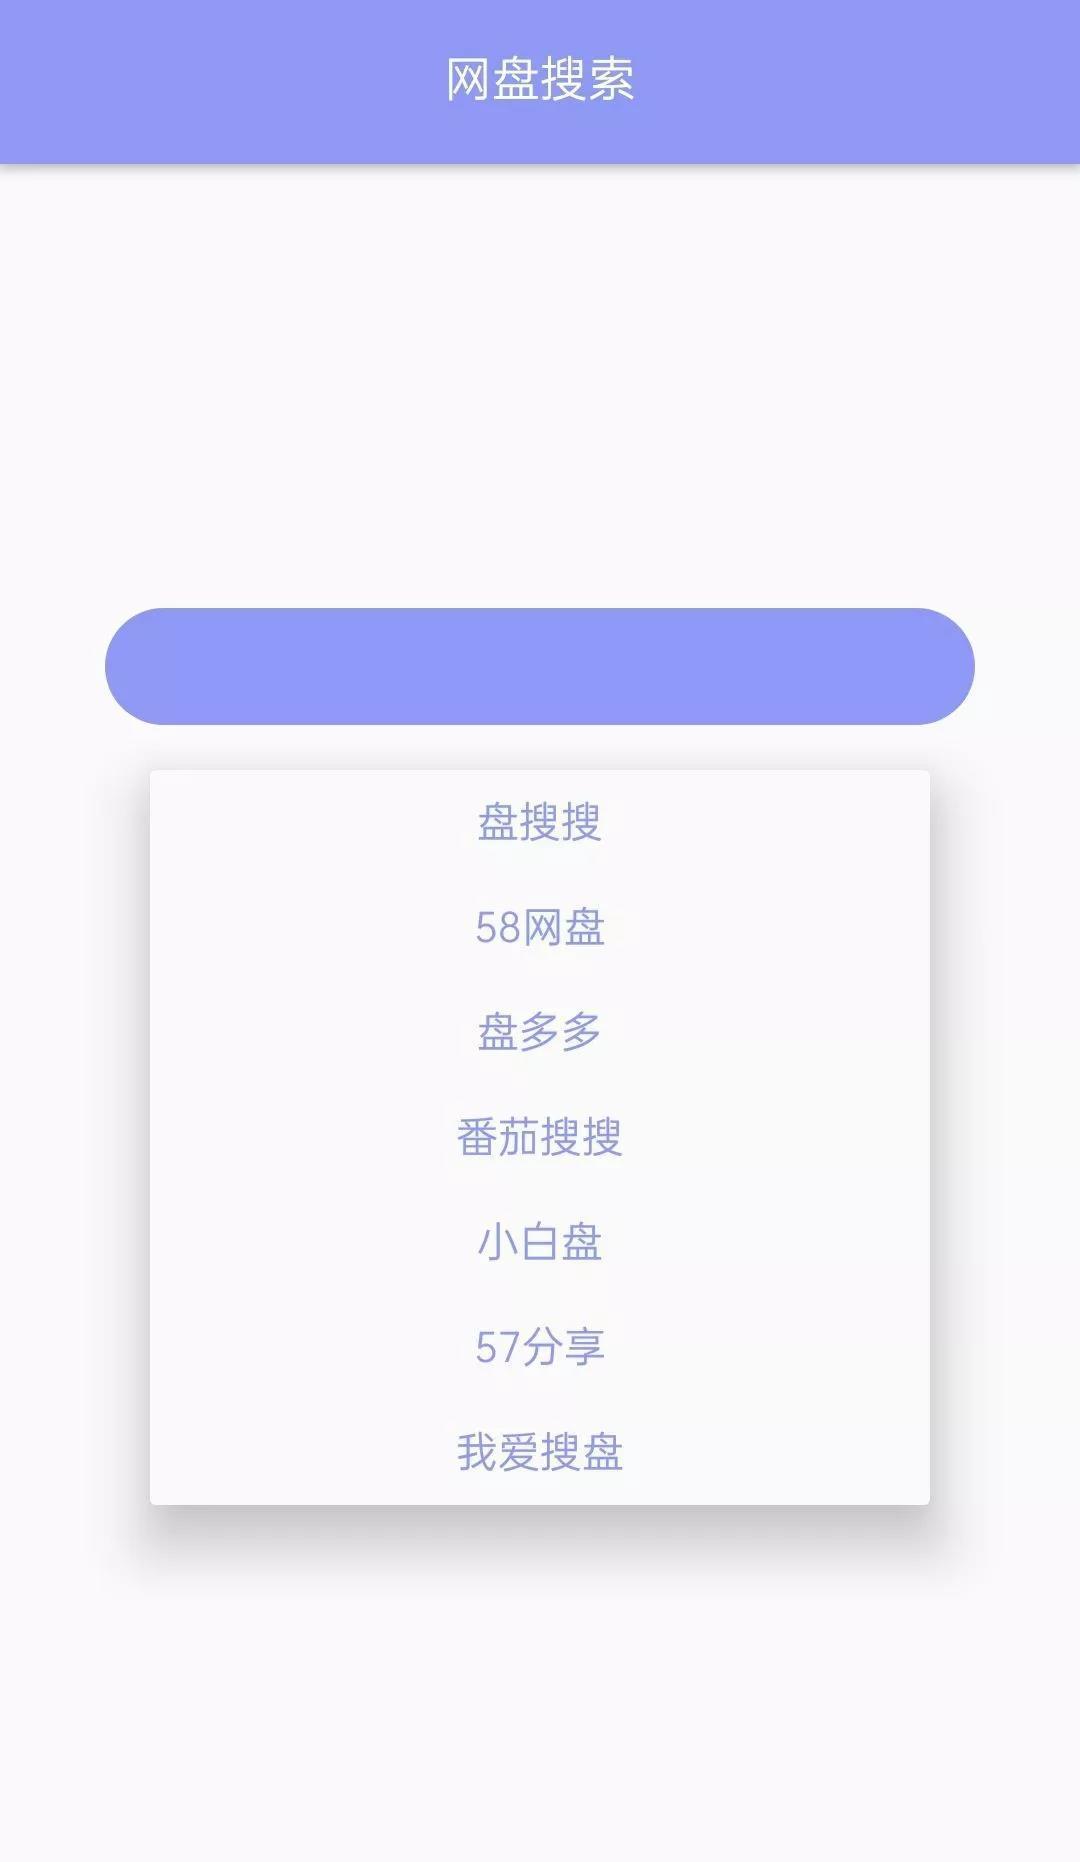 5ebcf624c2a9a83be53c8d6b 安卓网盘搜索引擎